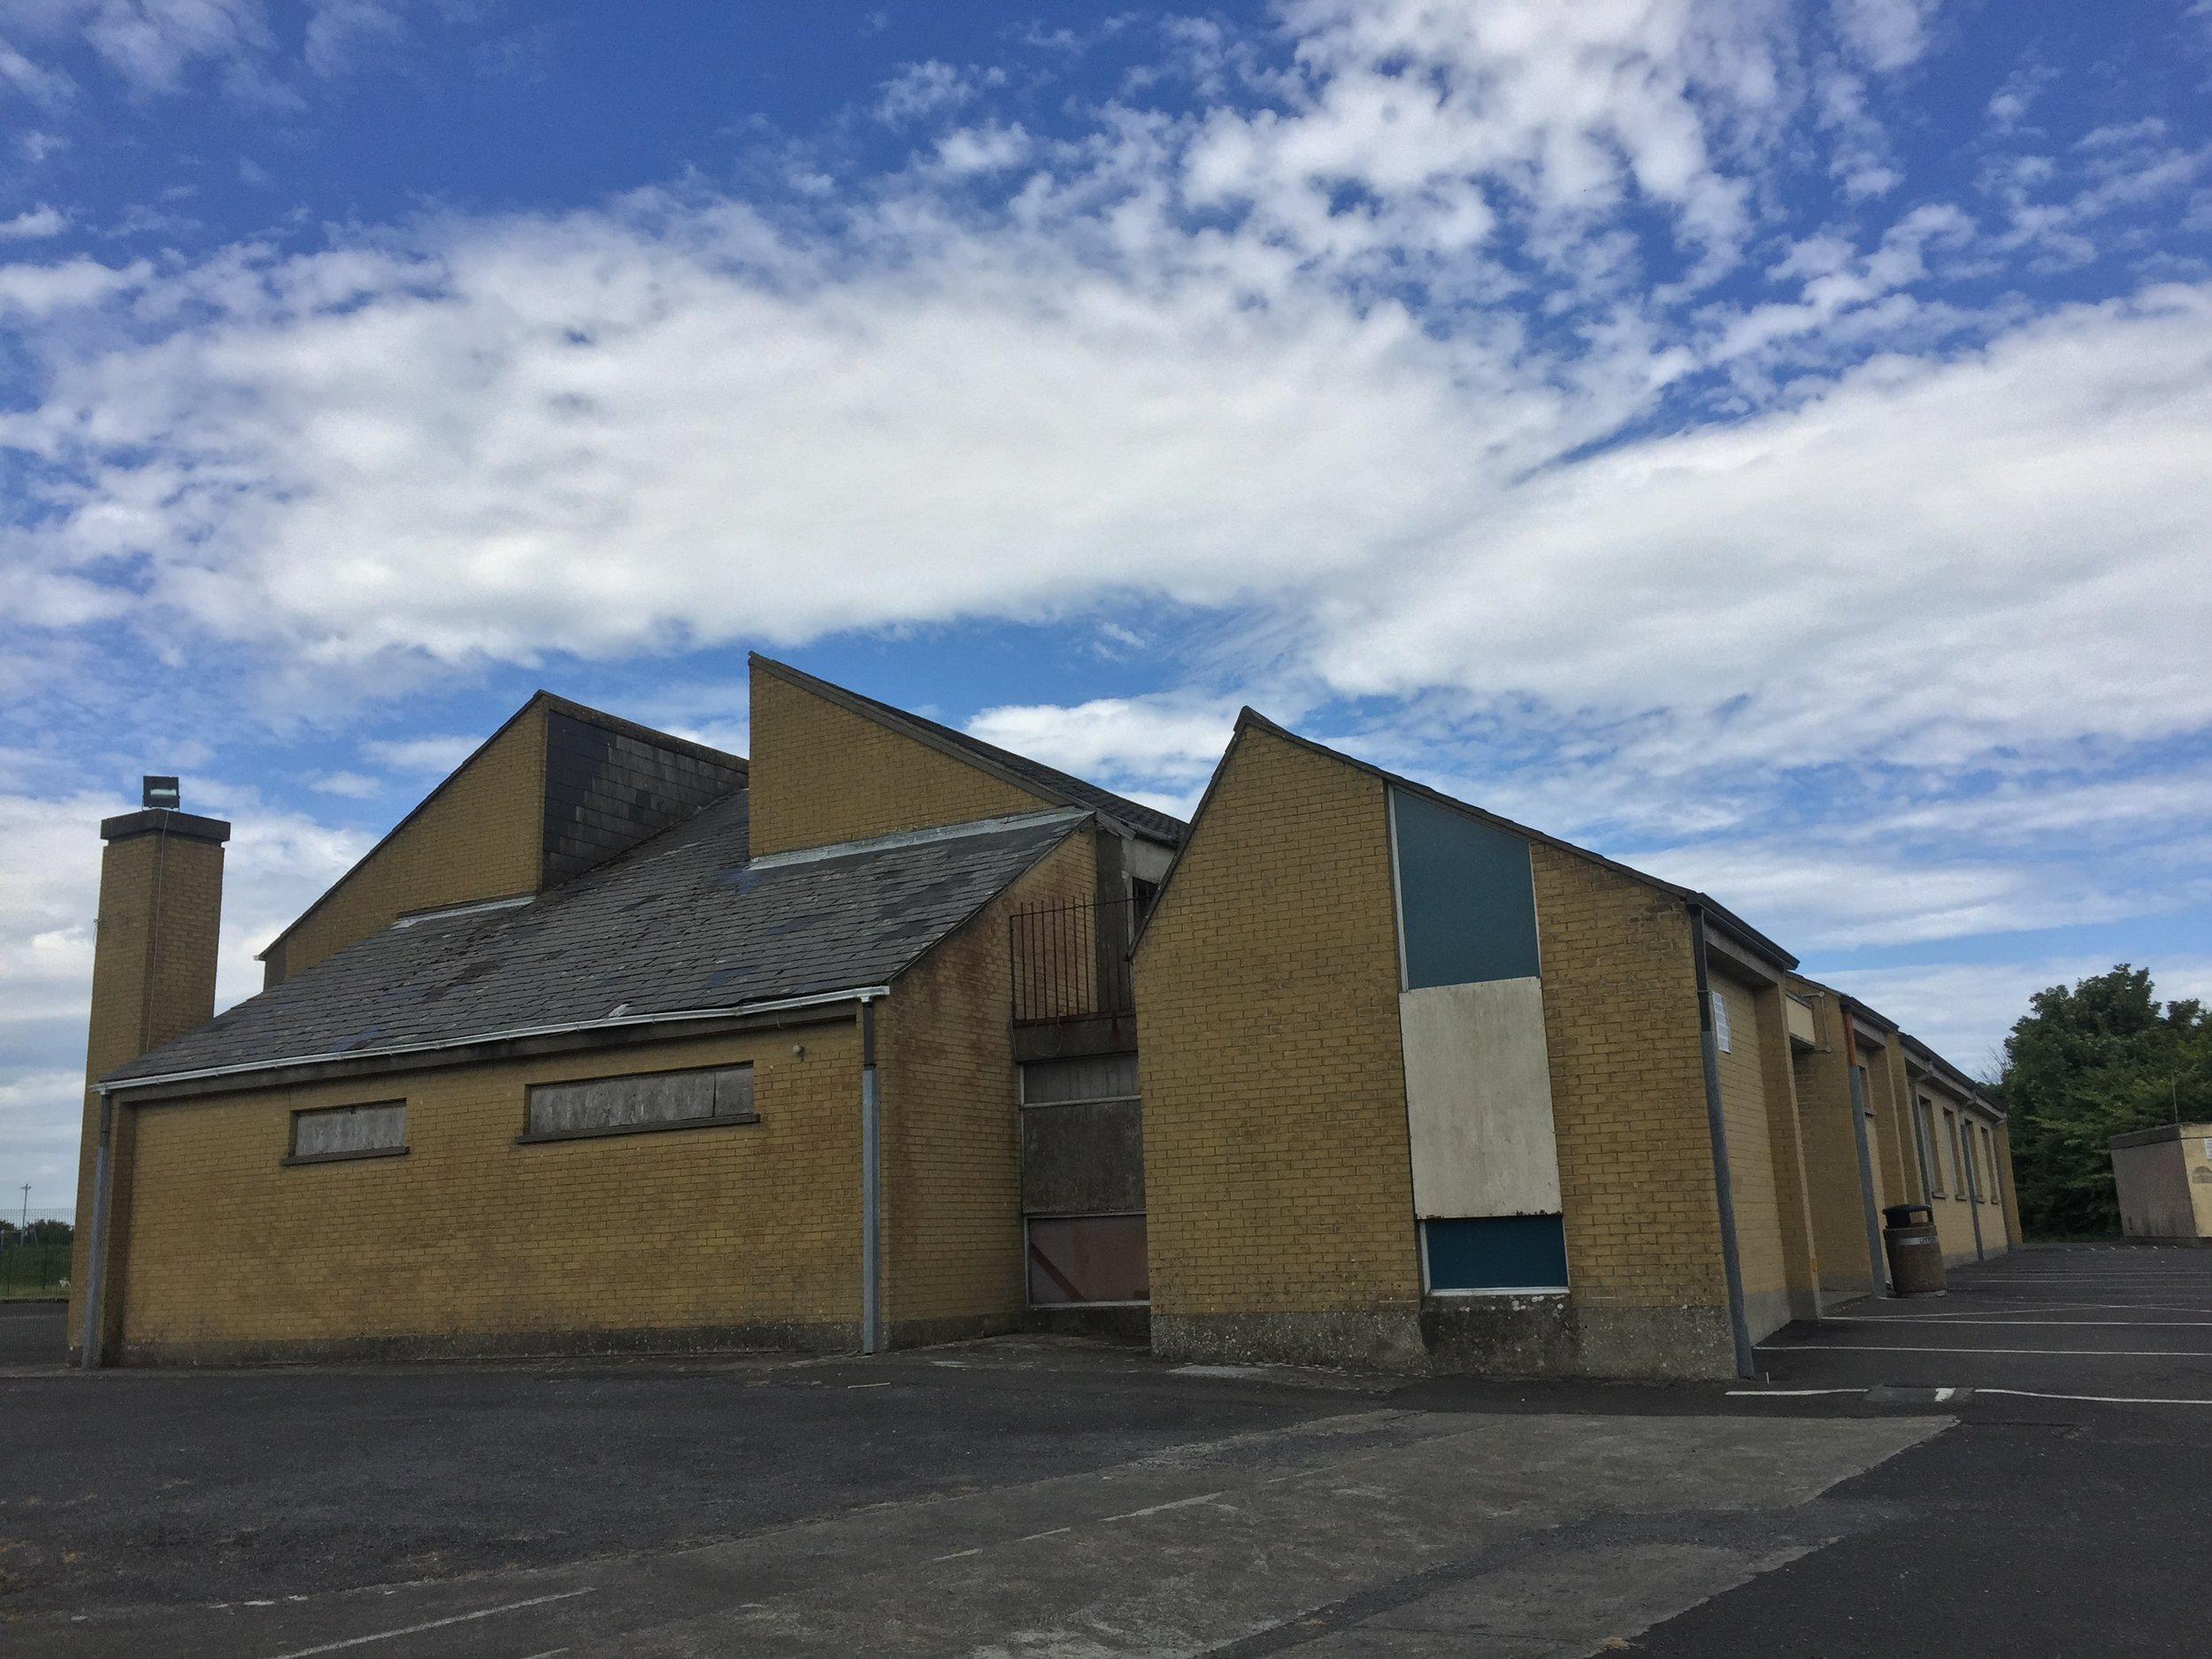 Old buildings at Scoil Iosa, Ballina, Co. Mayo